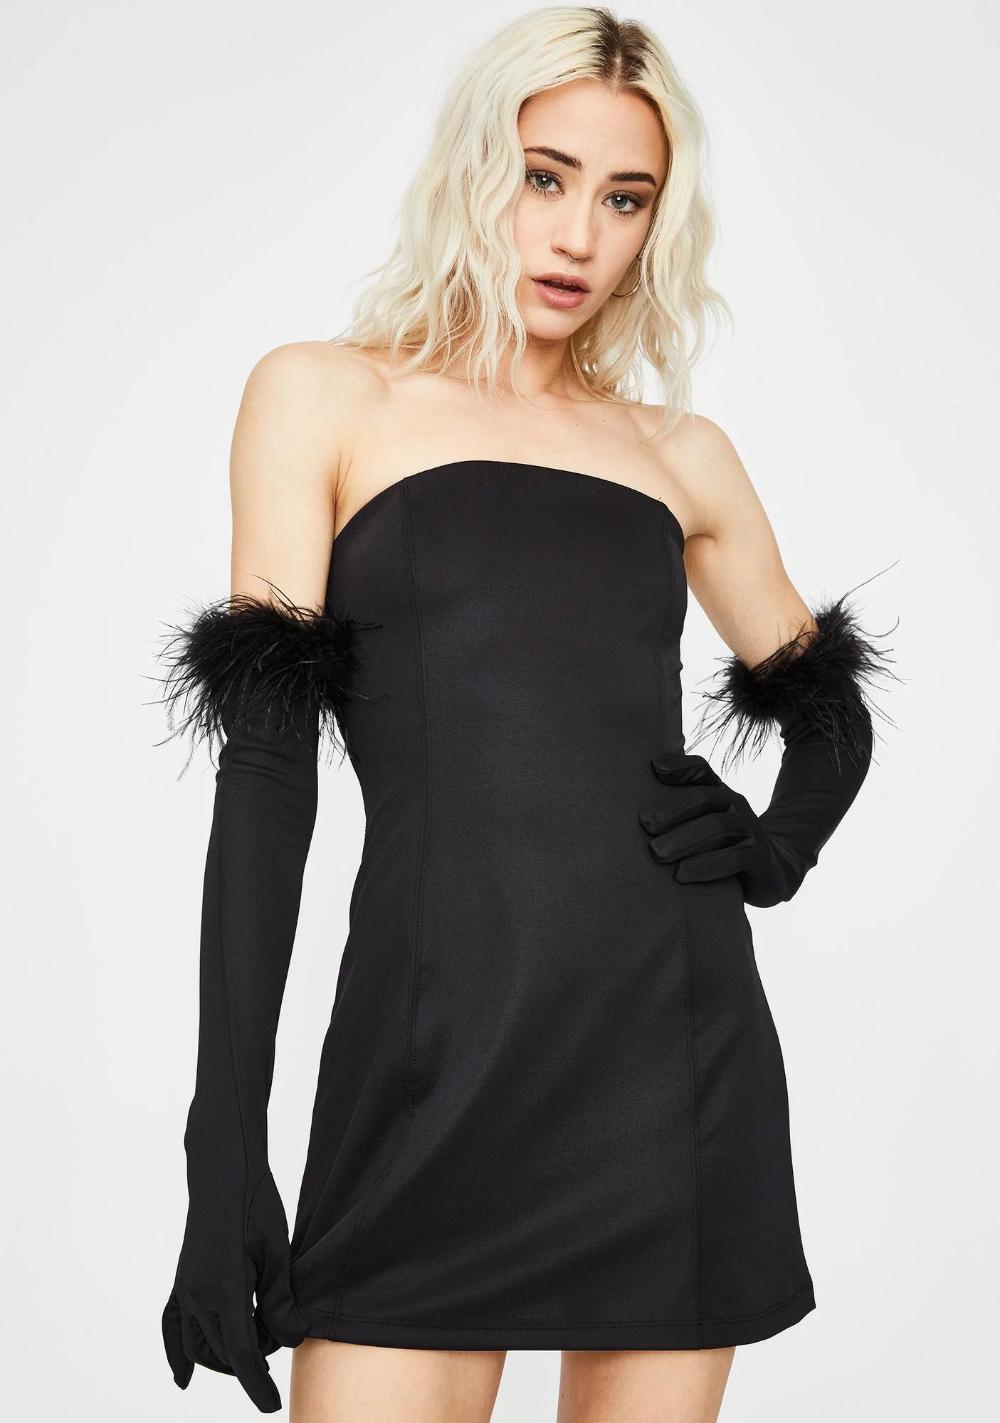 Noir Have Some Fun Strapless Dress Dresses Sparkly Mini Dress Strapless Dress [ 1423 x 1000 Pixel ]